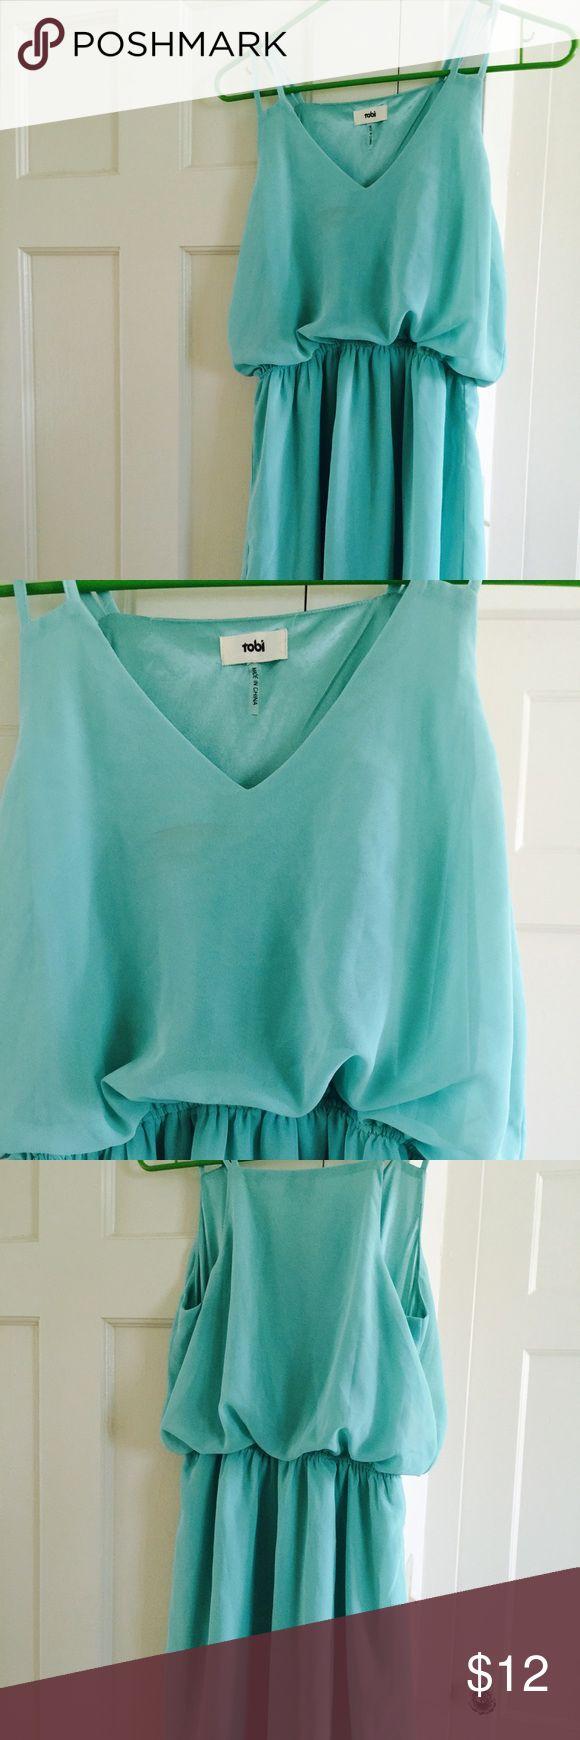 Tobi dress Aqua color dress from Tobi -like new condition Tobi Dresses Mini